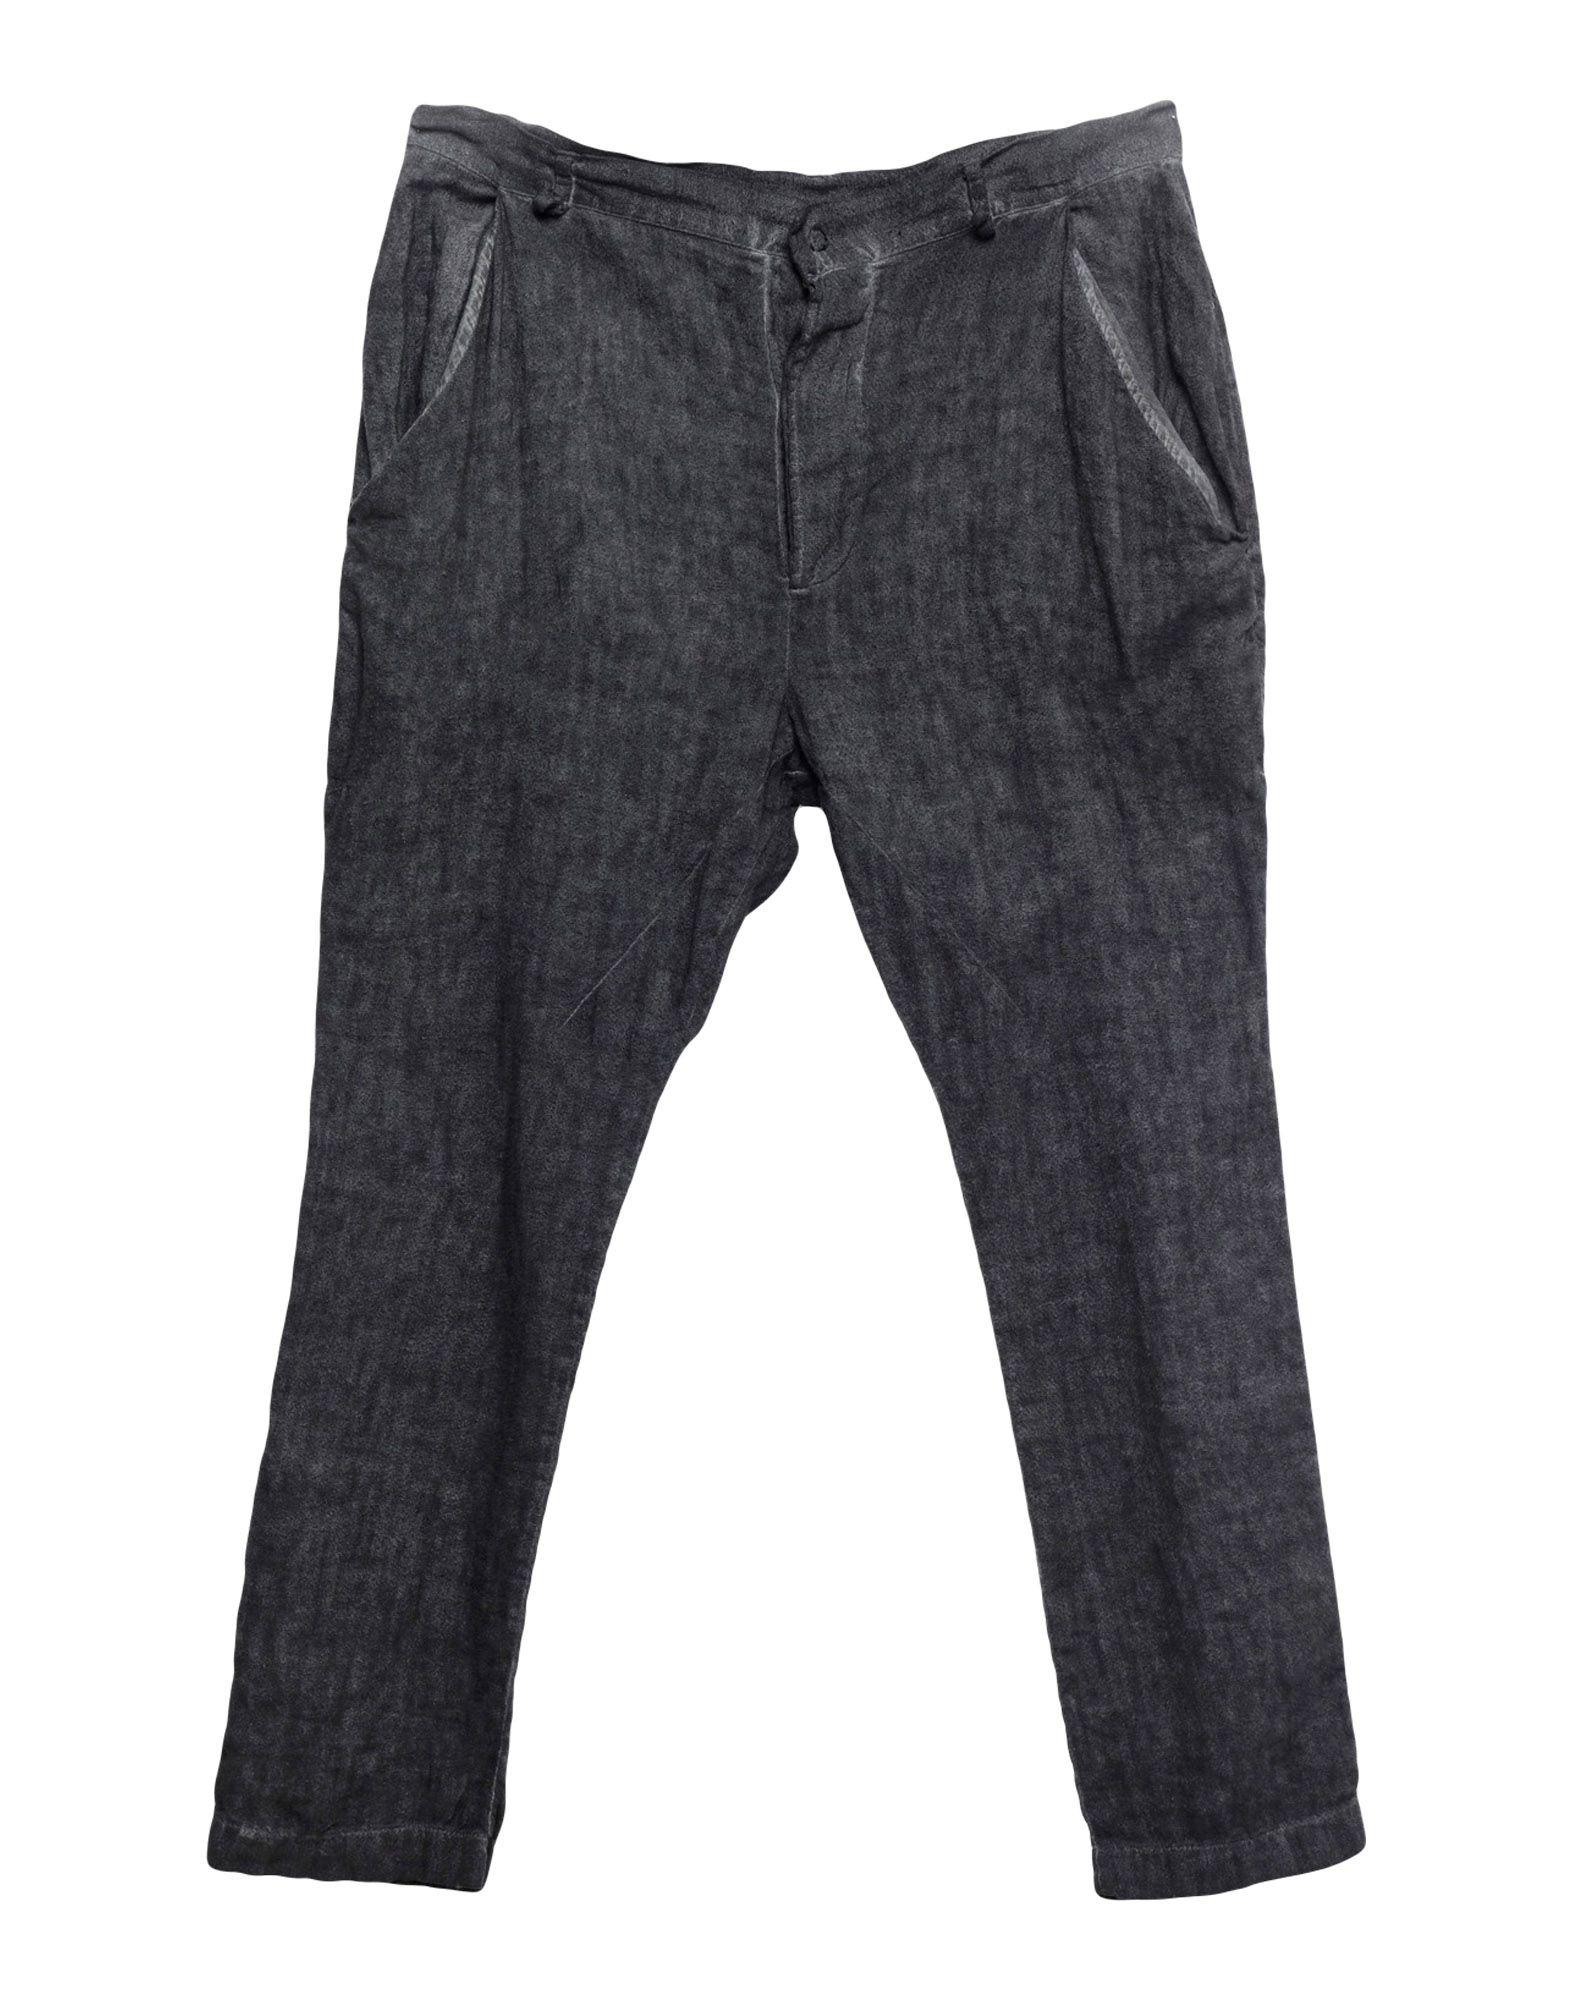 UN-NAMABLE Повседневные брюки 11 un dici пиджак